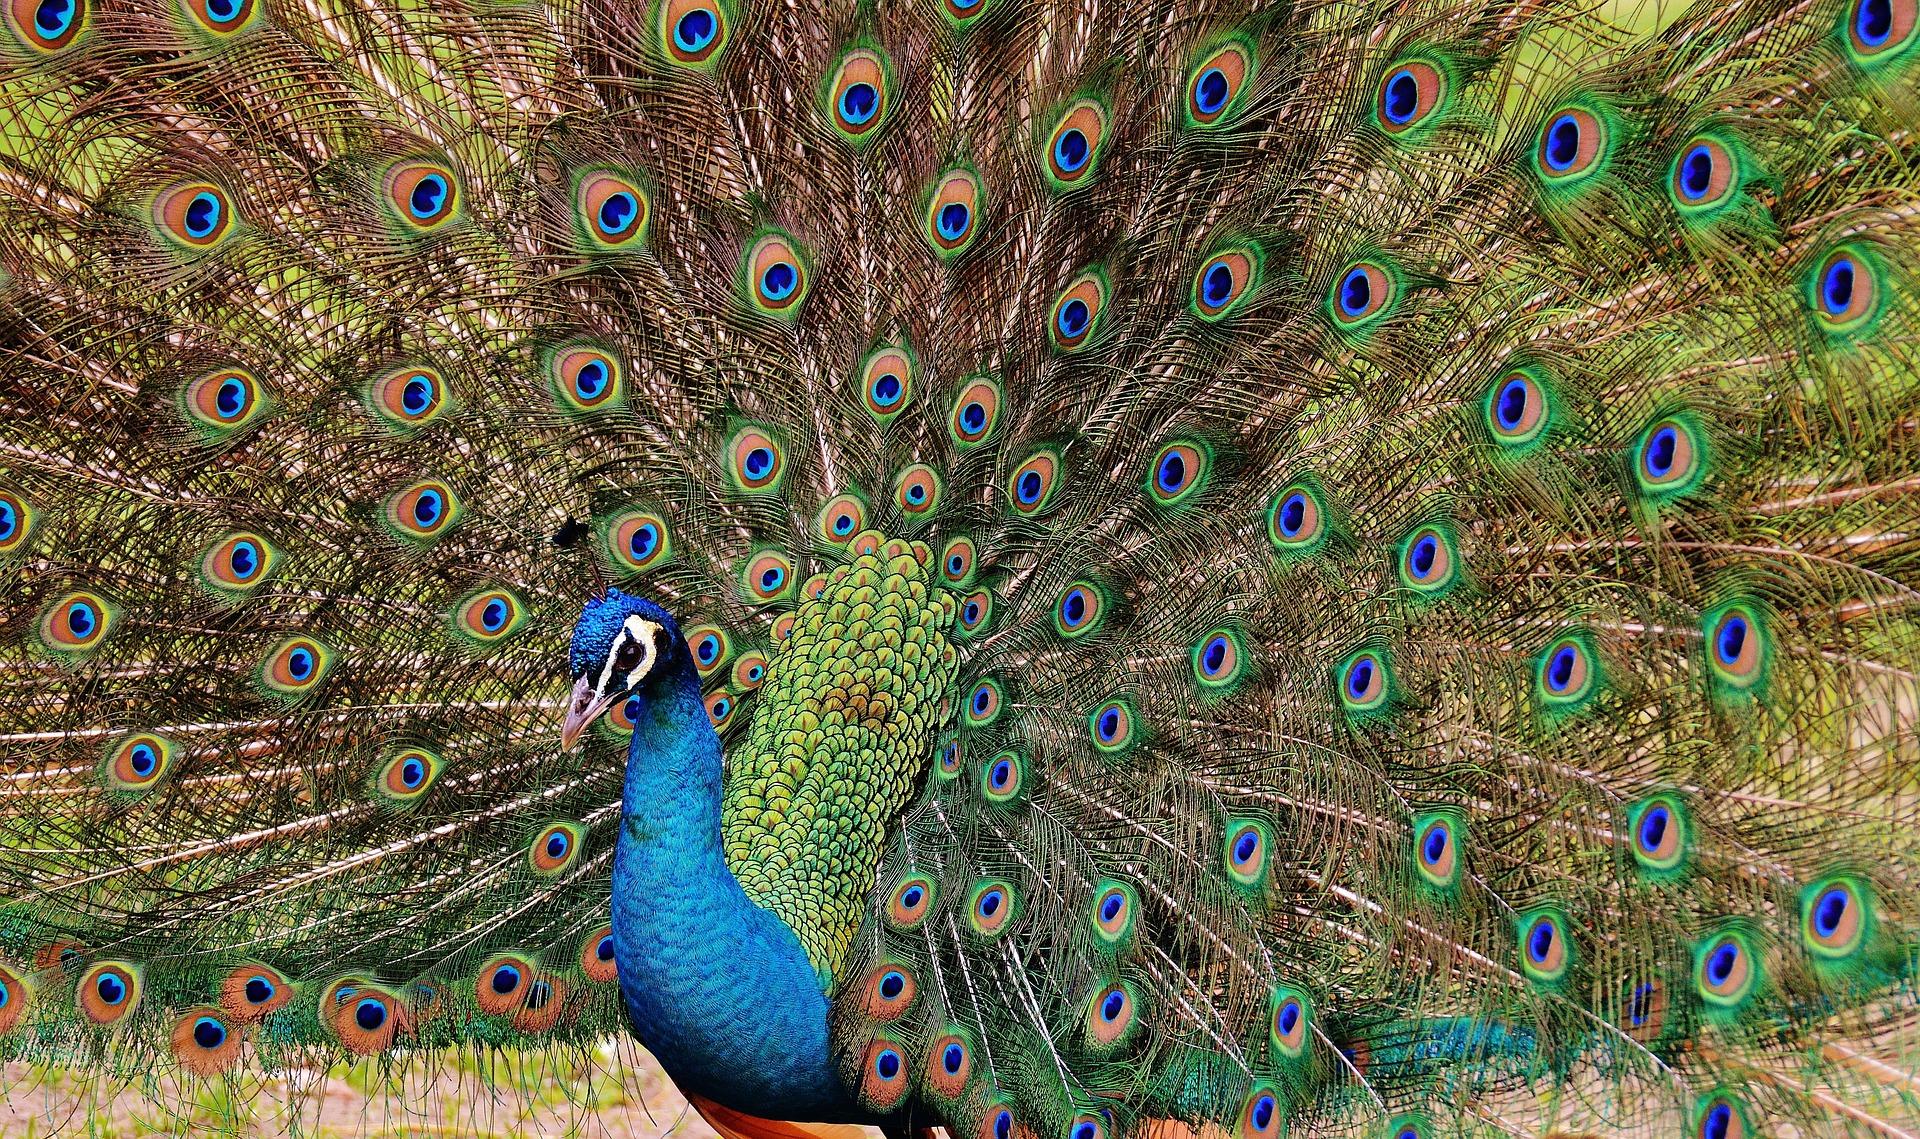 peacock-1312431_1920